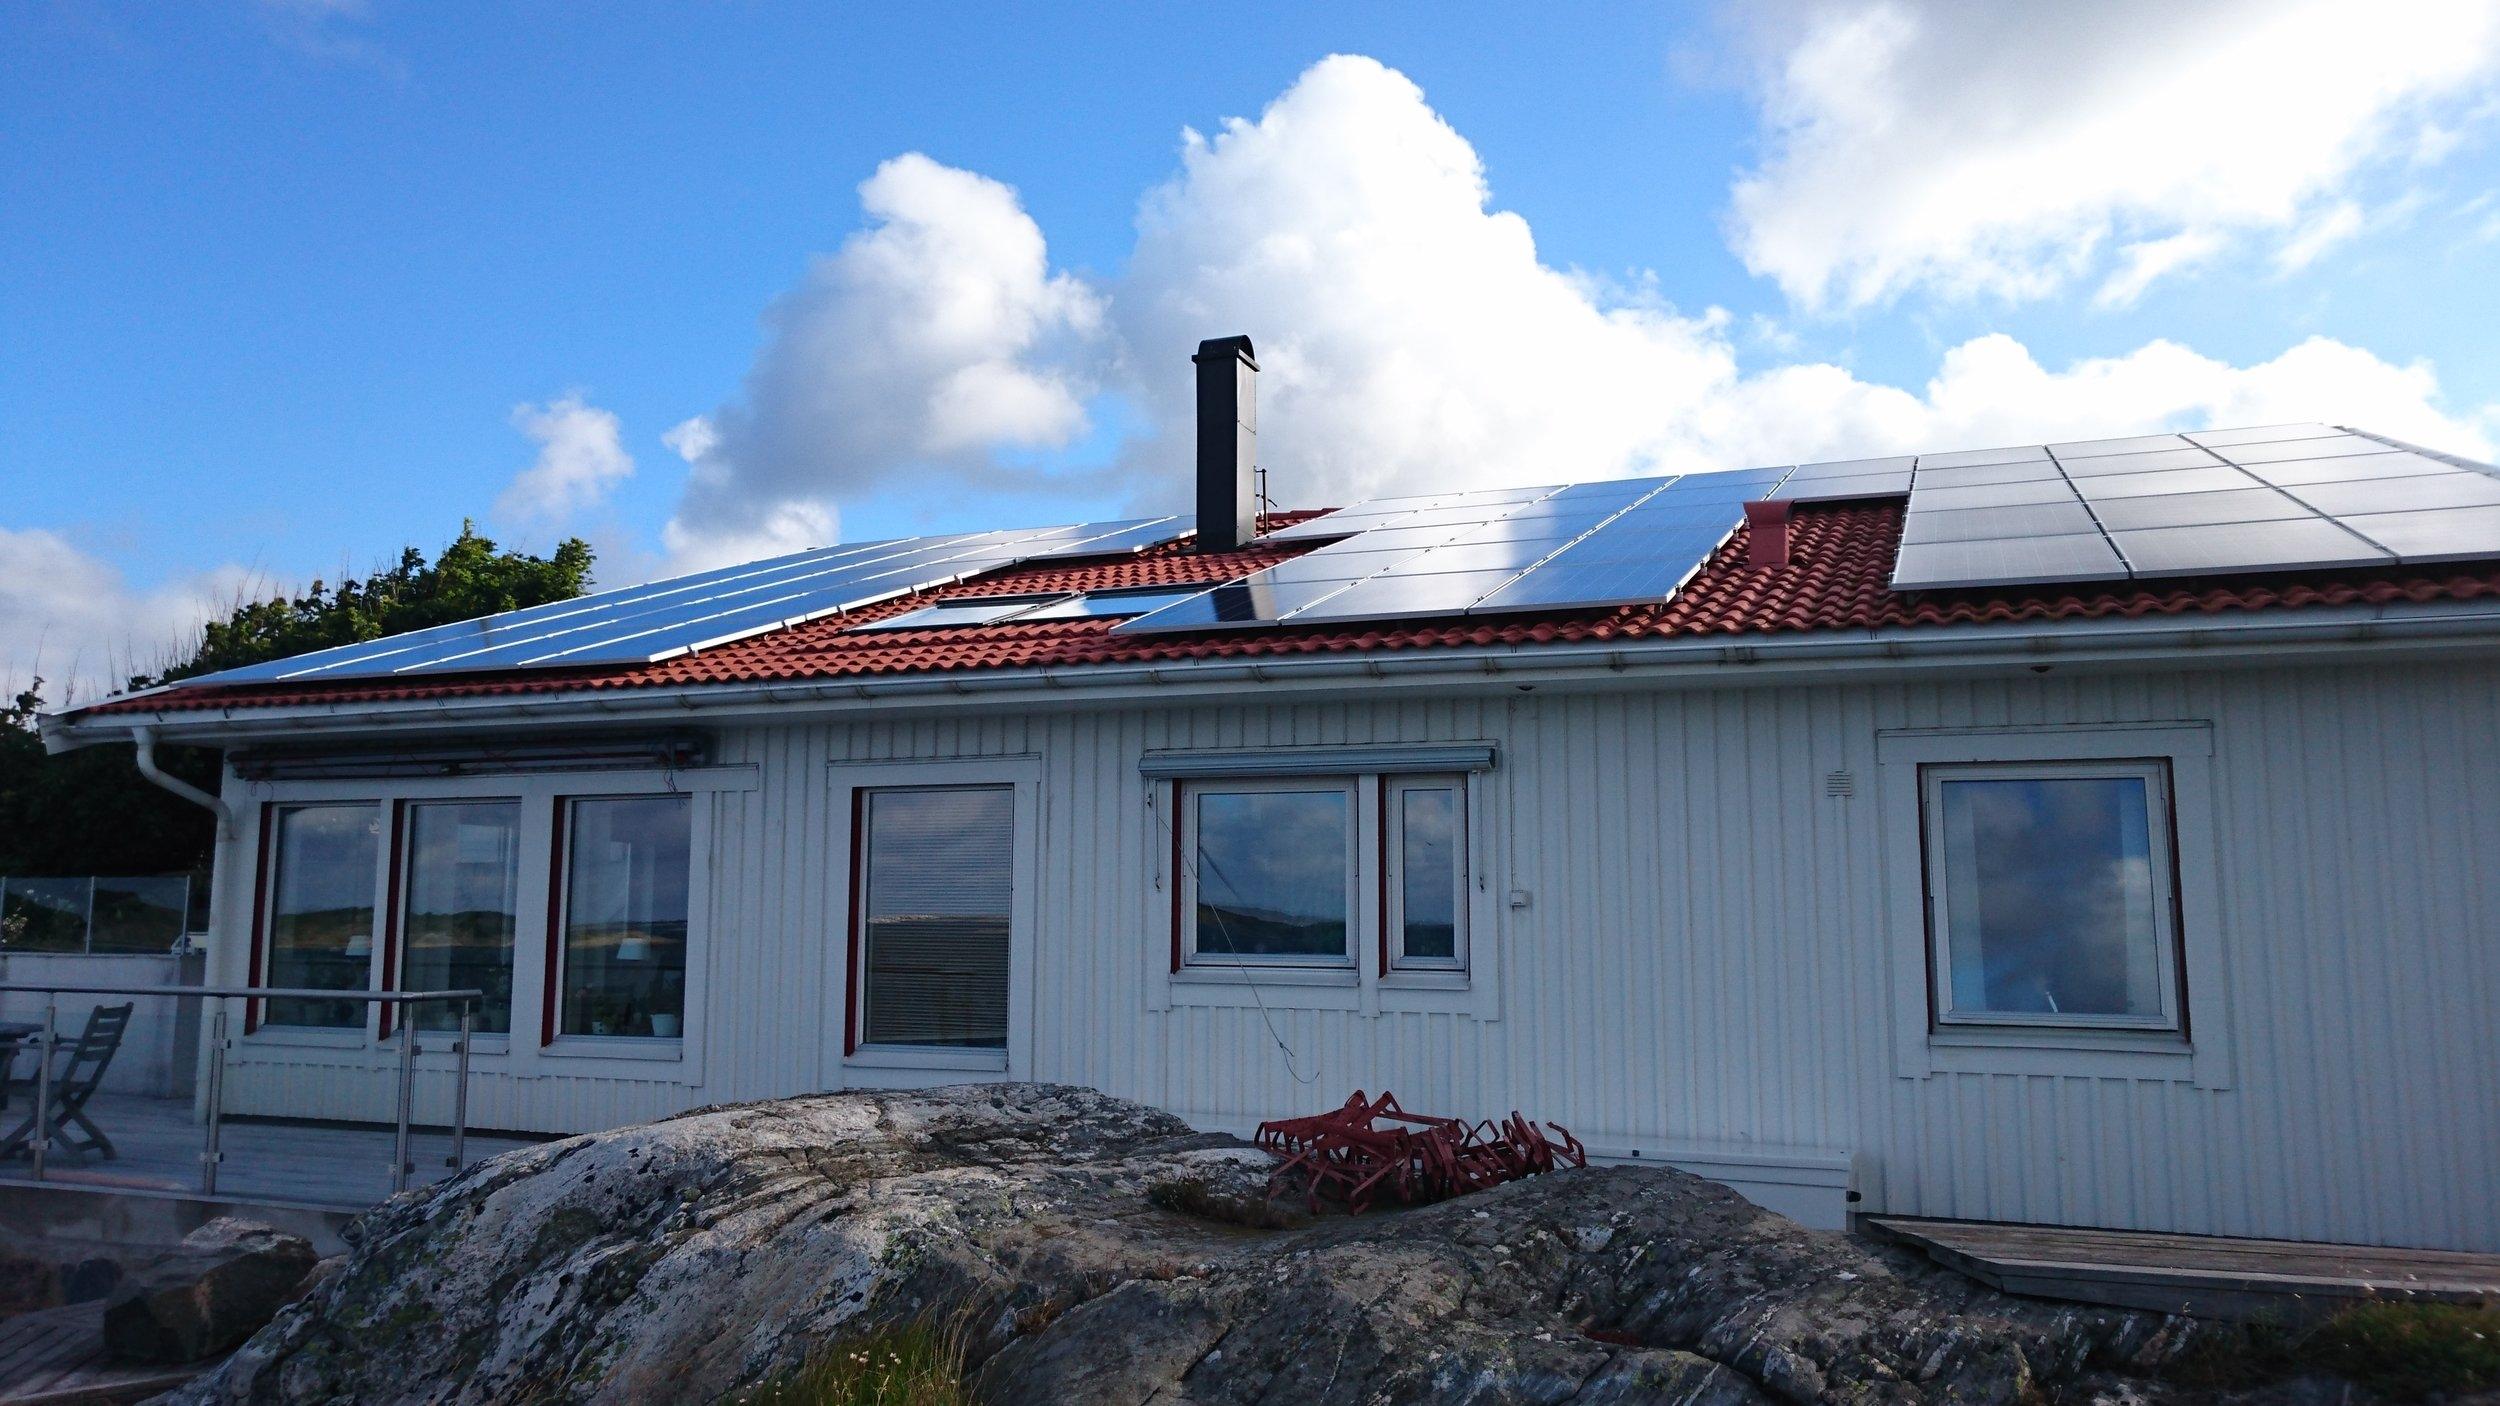 56 st 260W Hareon Solar  Investering 252 000 kr, återbetalningstid 8 år  Energiproduktion 14 500 kWh/år